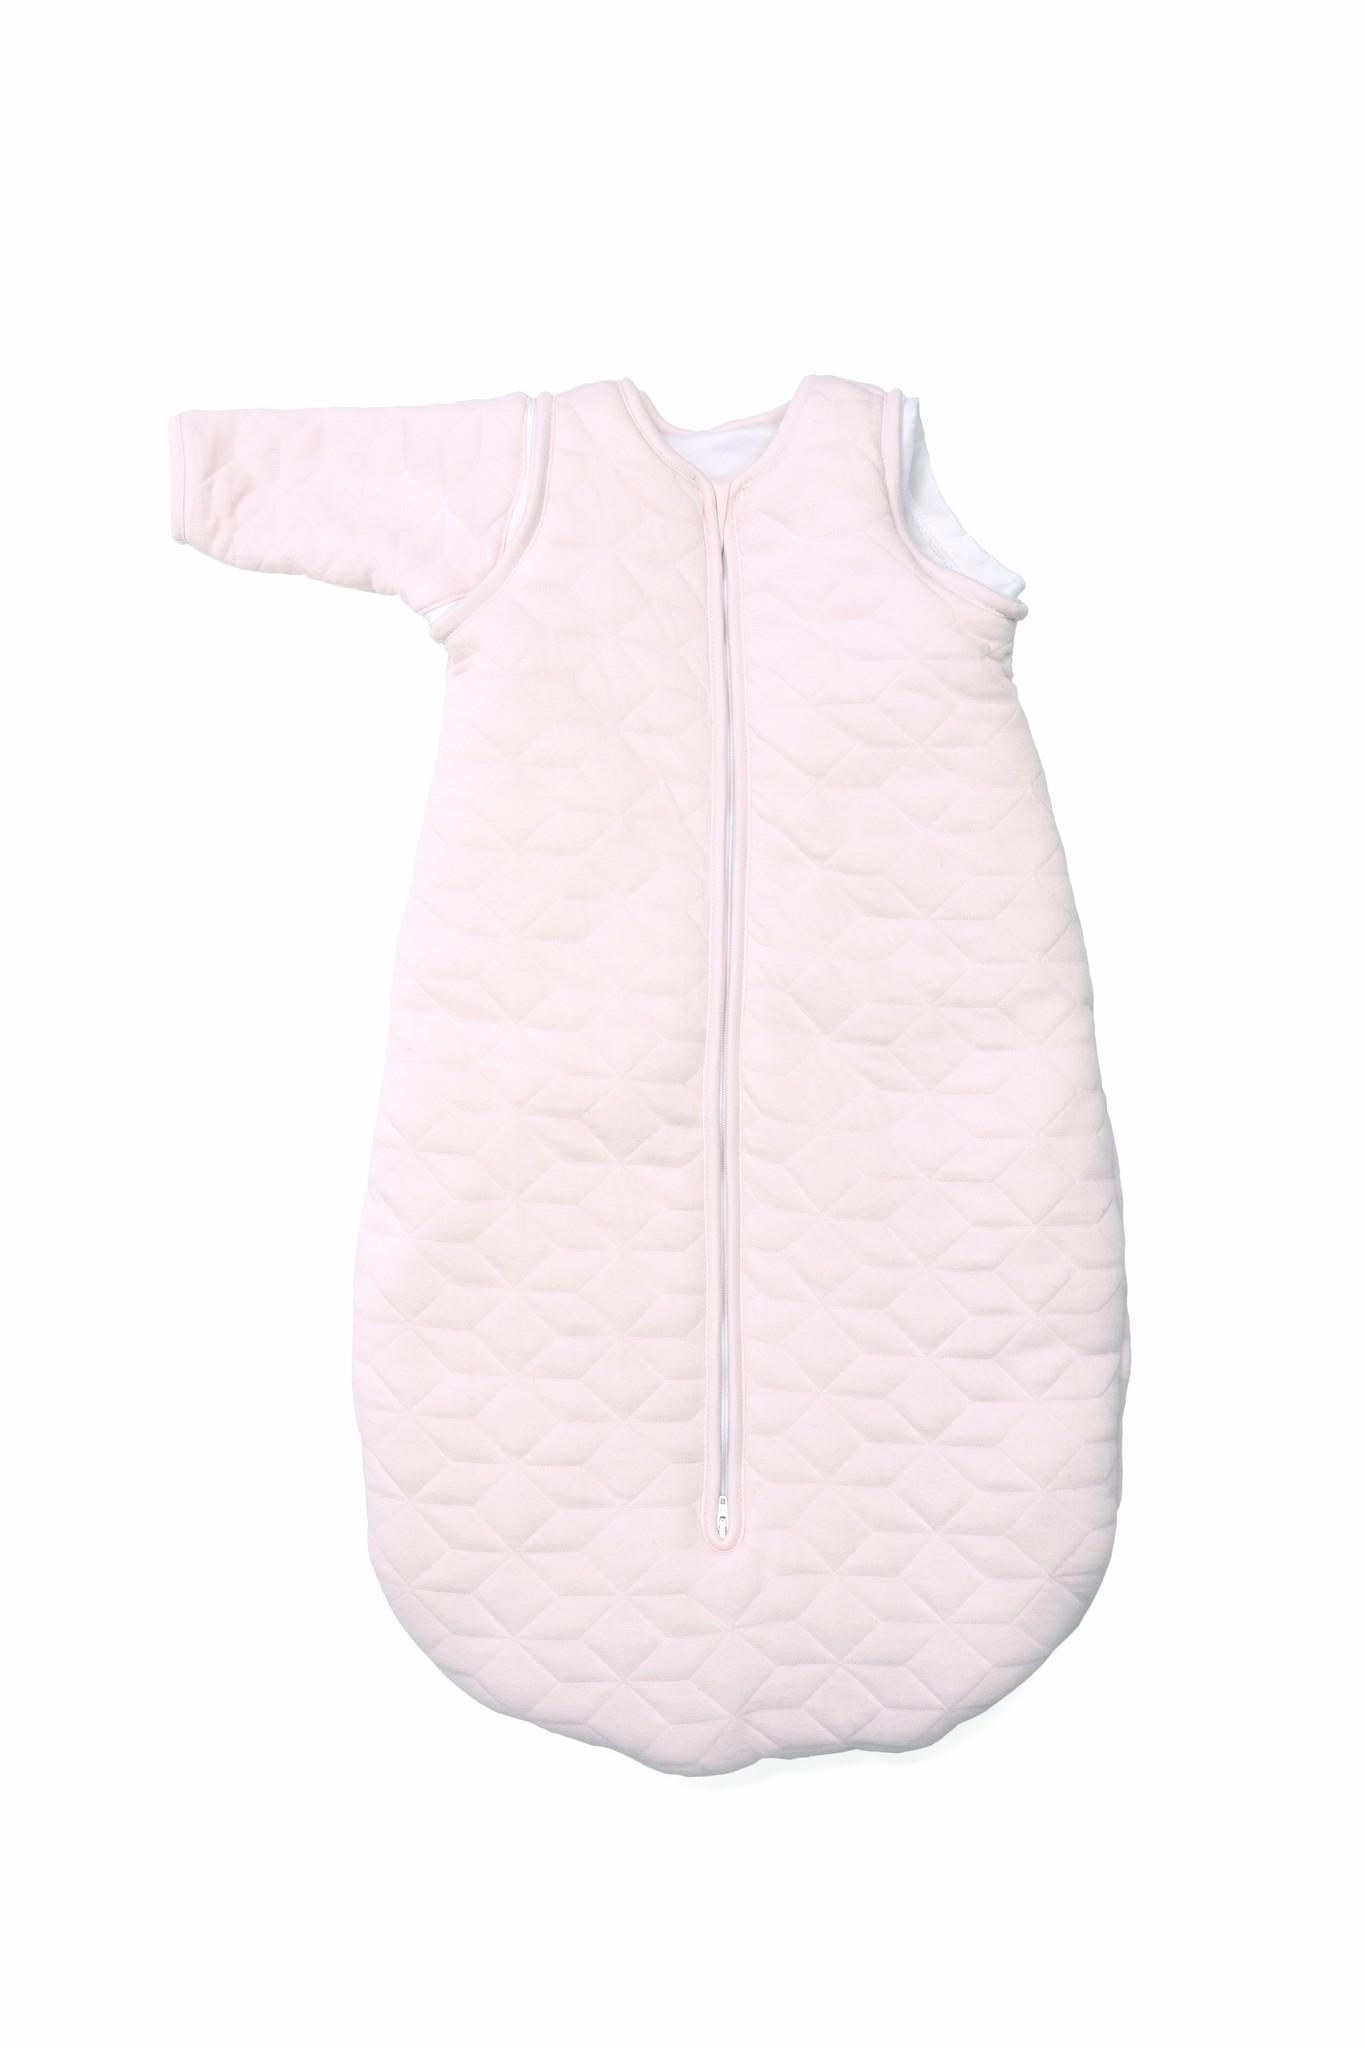 Jersey slaapzak 90cm met afritsbare mouwen Star Soft Pink-2